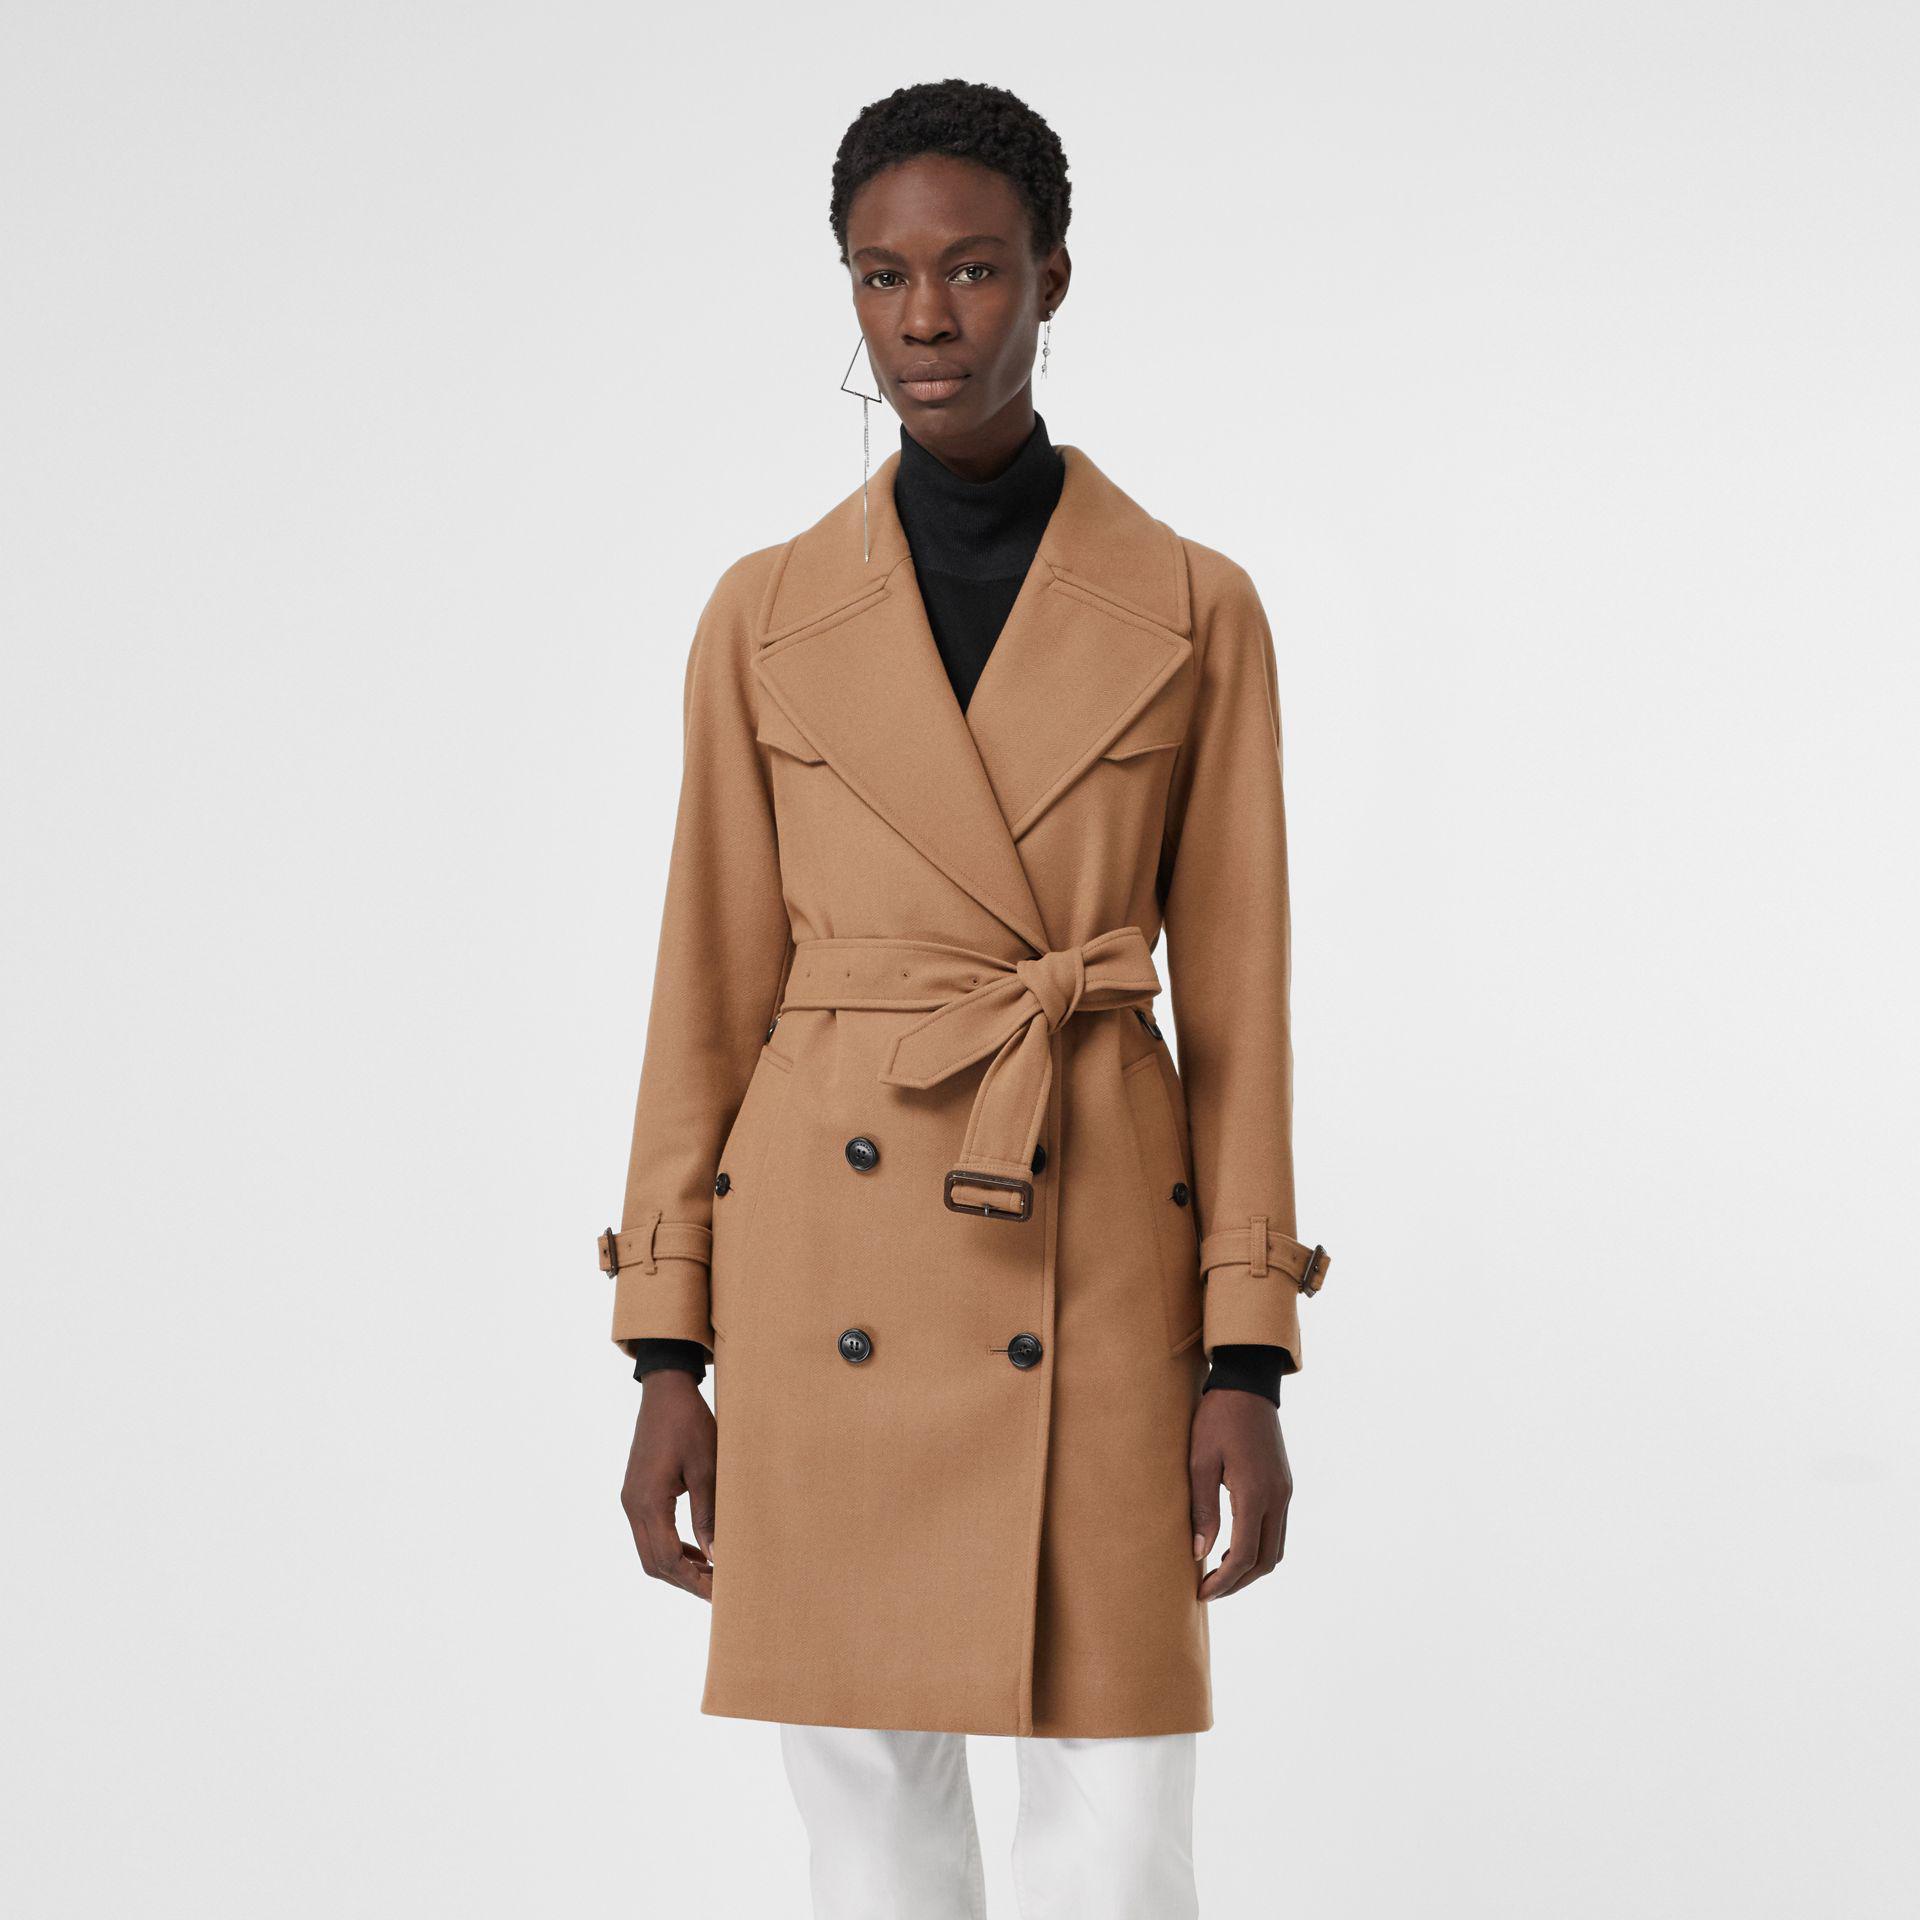 Wool Cashmere Trench View Herringbone Multicolor Burberry Fullscreen Blend Coat Lyst wqT66v